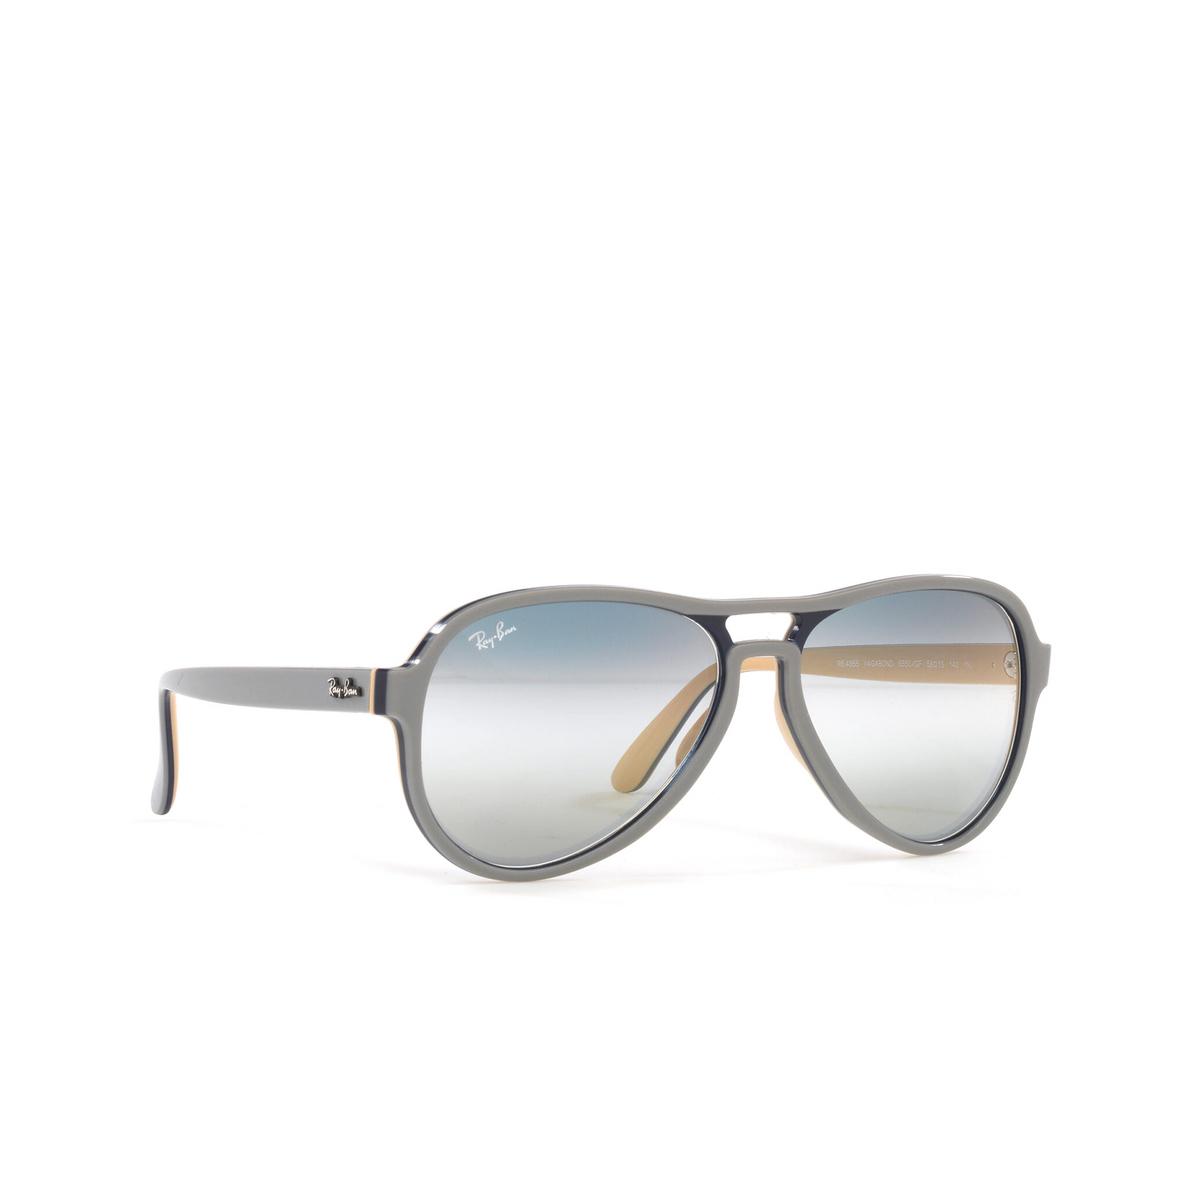 Ray-Ban® Aviator Sunglasses: Vagabond RB4355 color Light Grey Blue Light Brown 6550GF - three-quarters view.